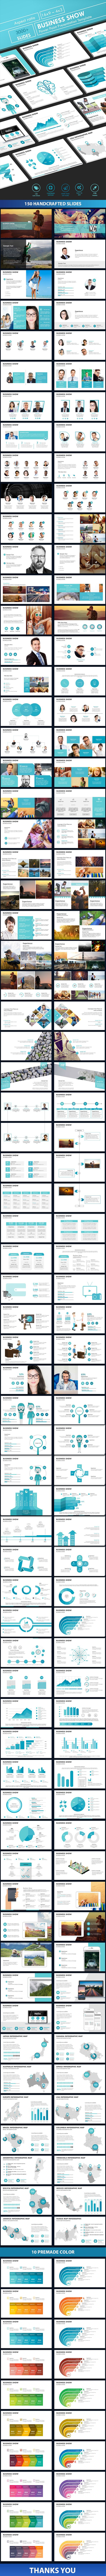 Business Show PowerPoint Presentation Template #corporate #ecomerce #marketing #analysis